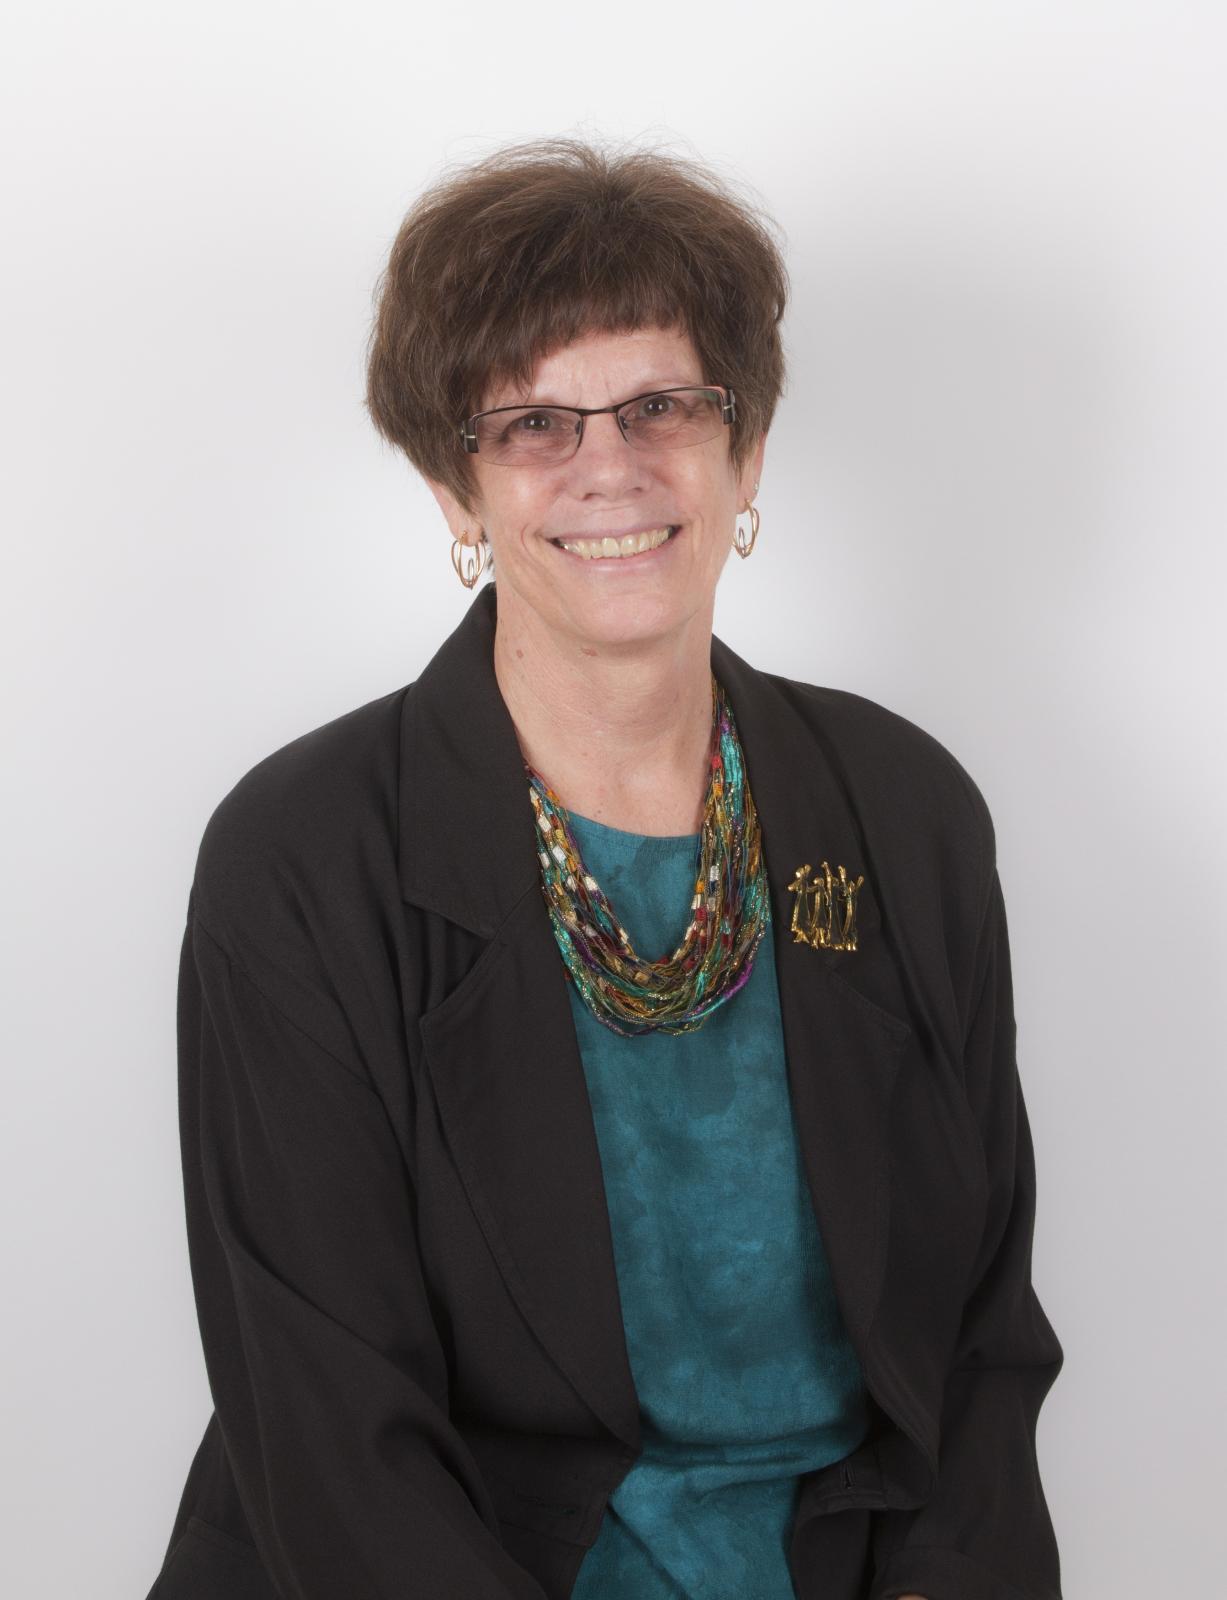 Gail Bridges-Rea